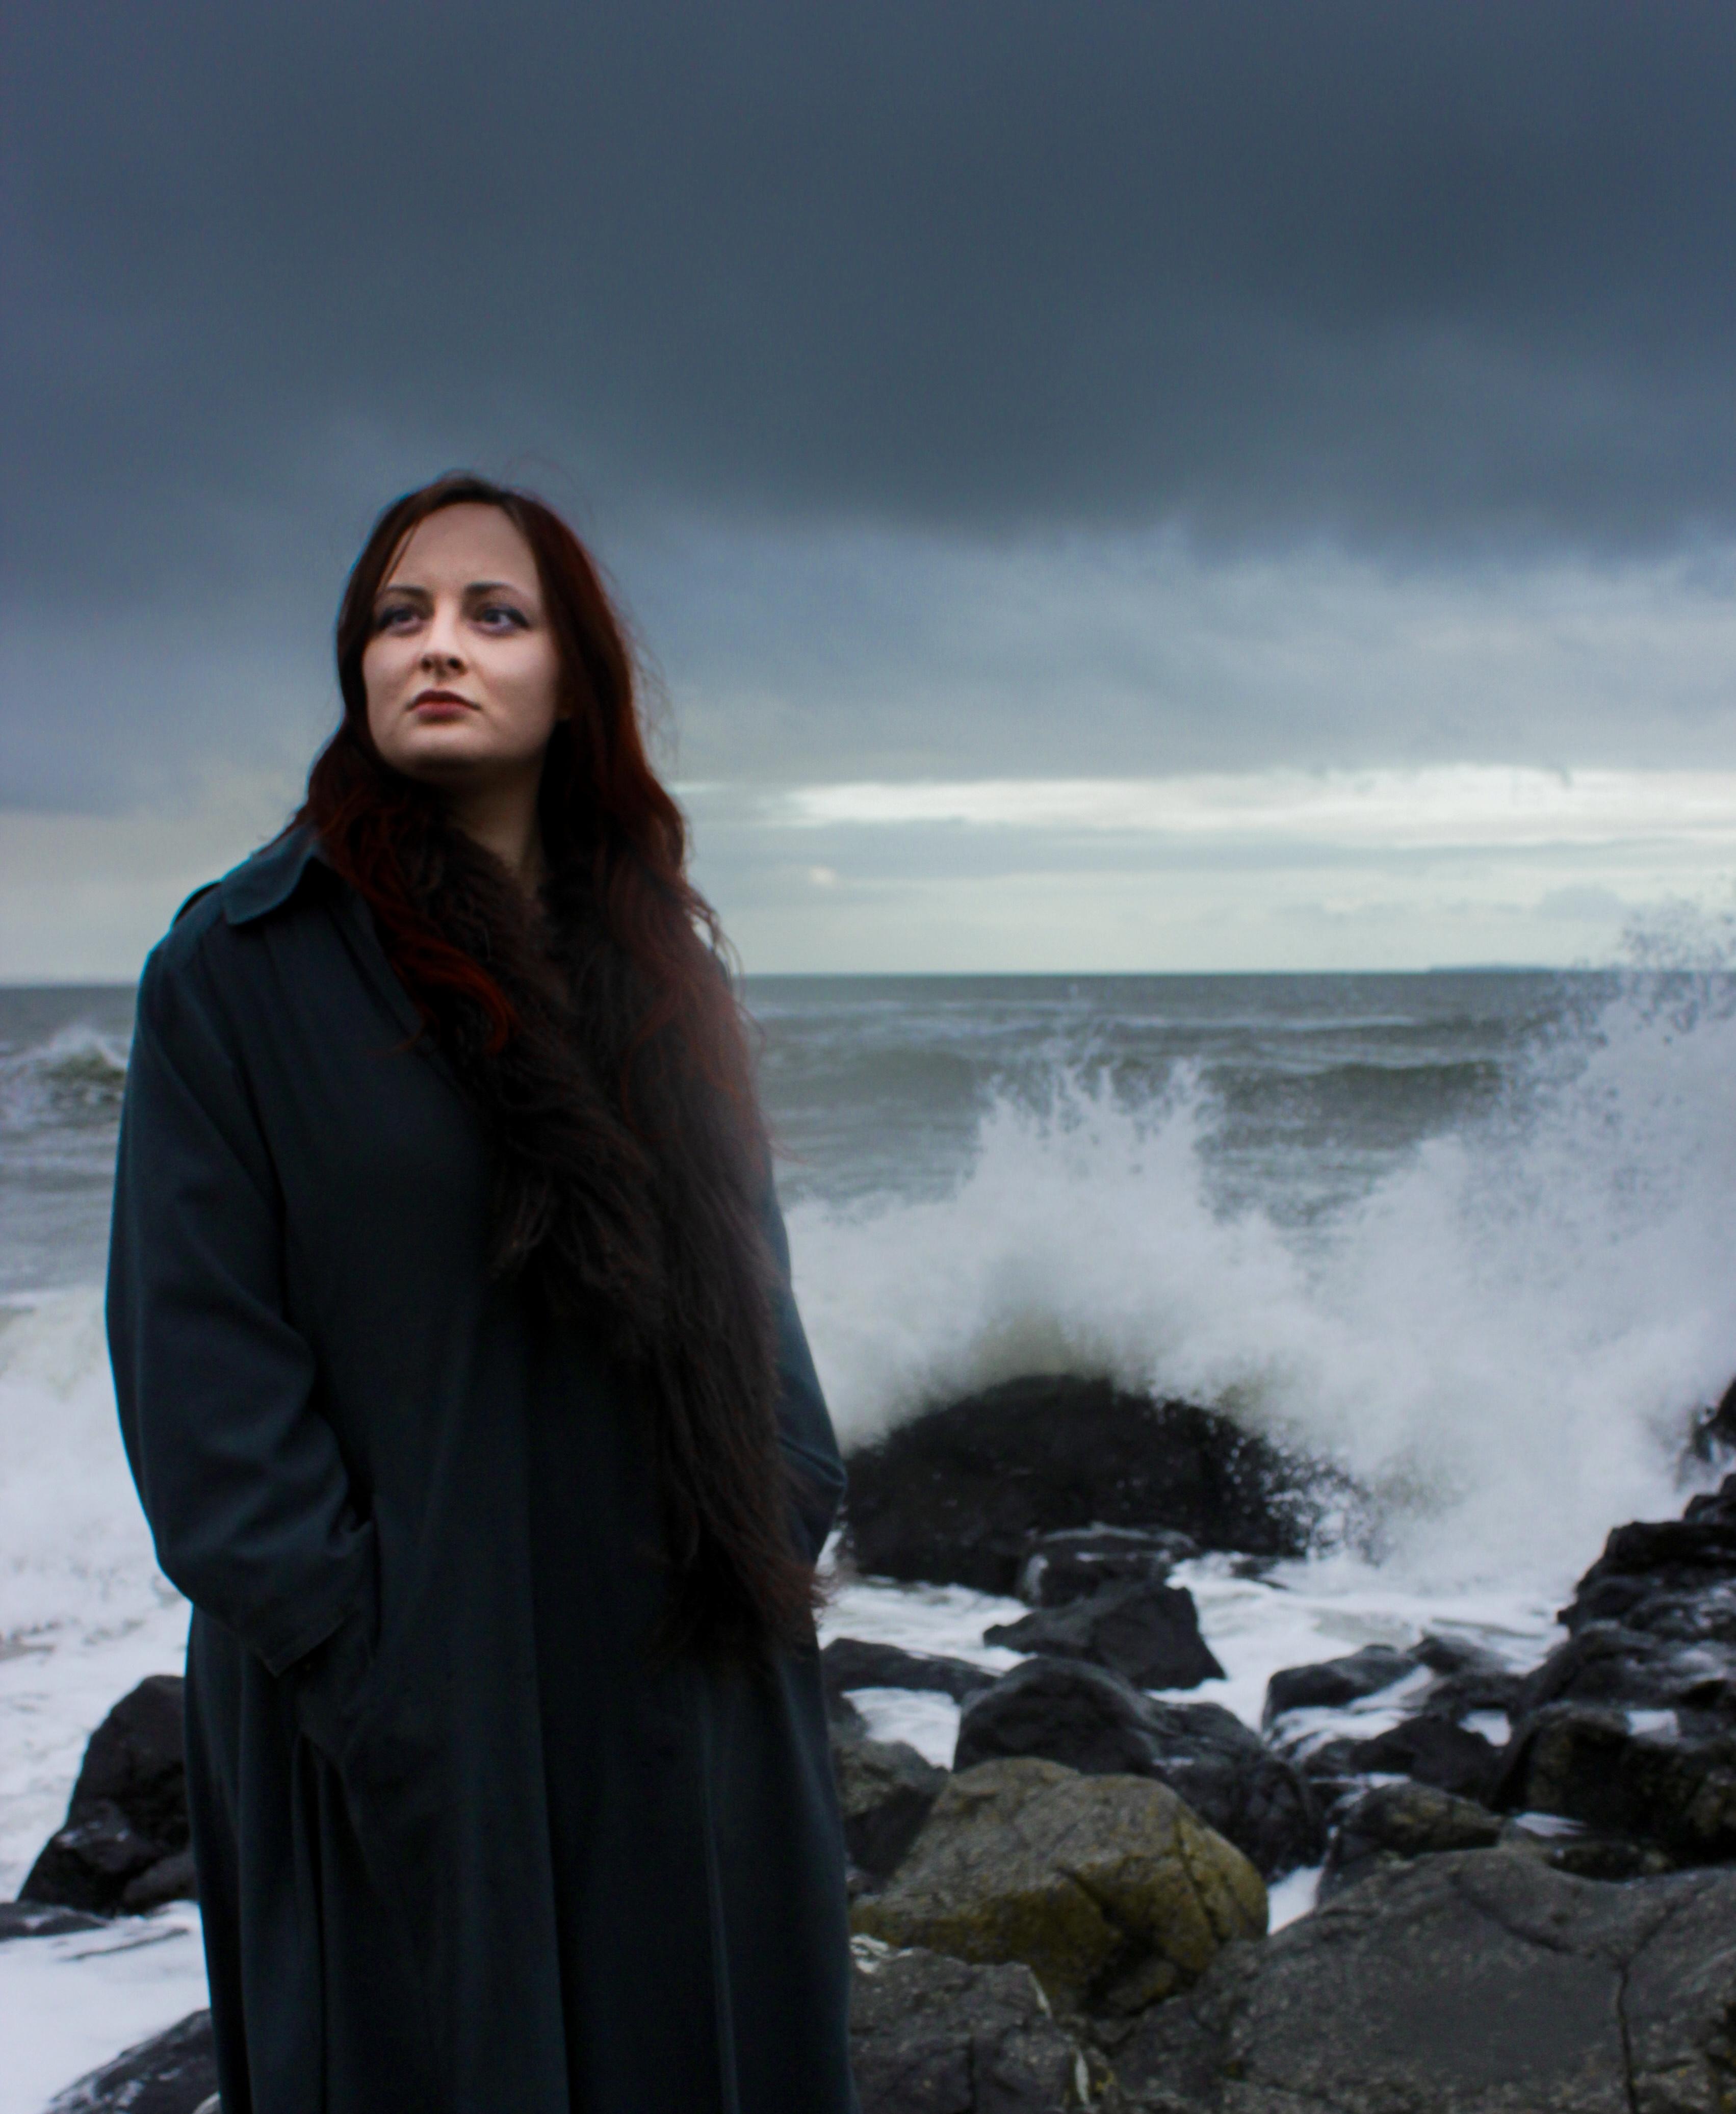 Zoë Moskal: On The Rocks